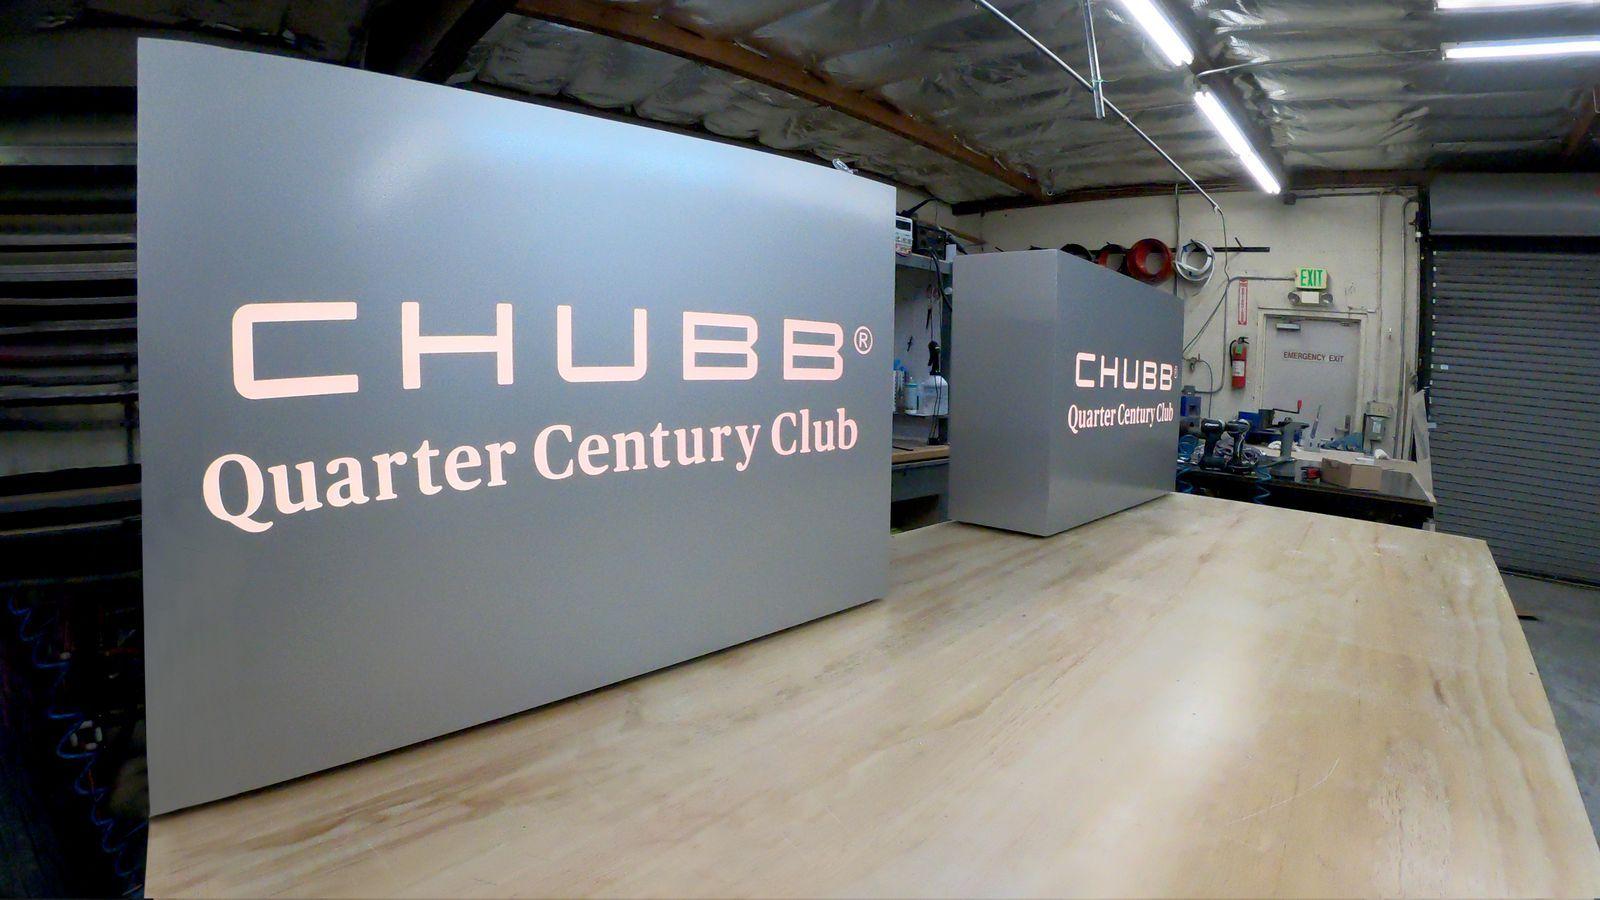 Chubb illuminated signs